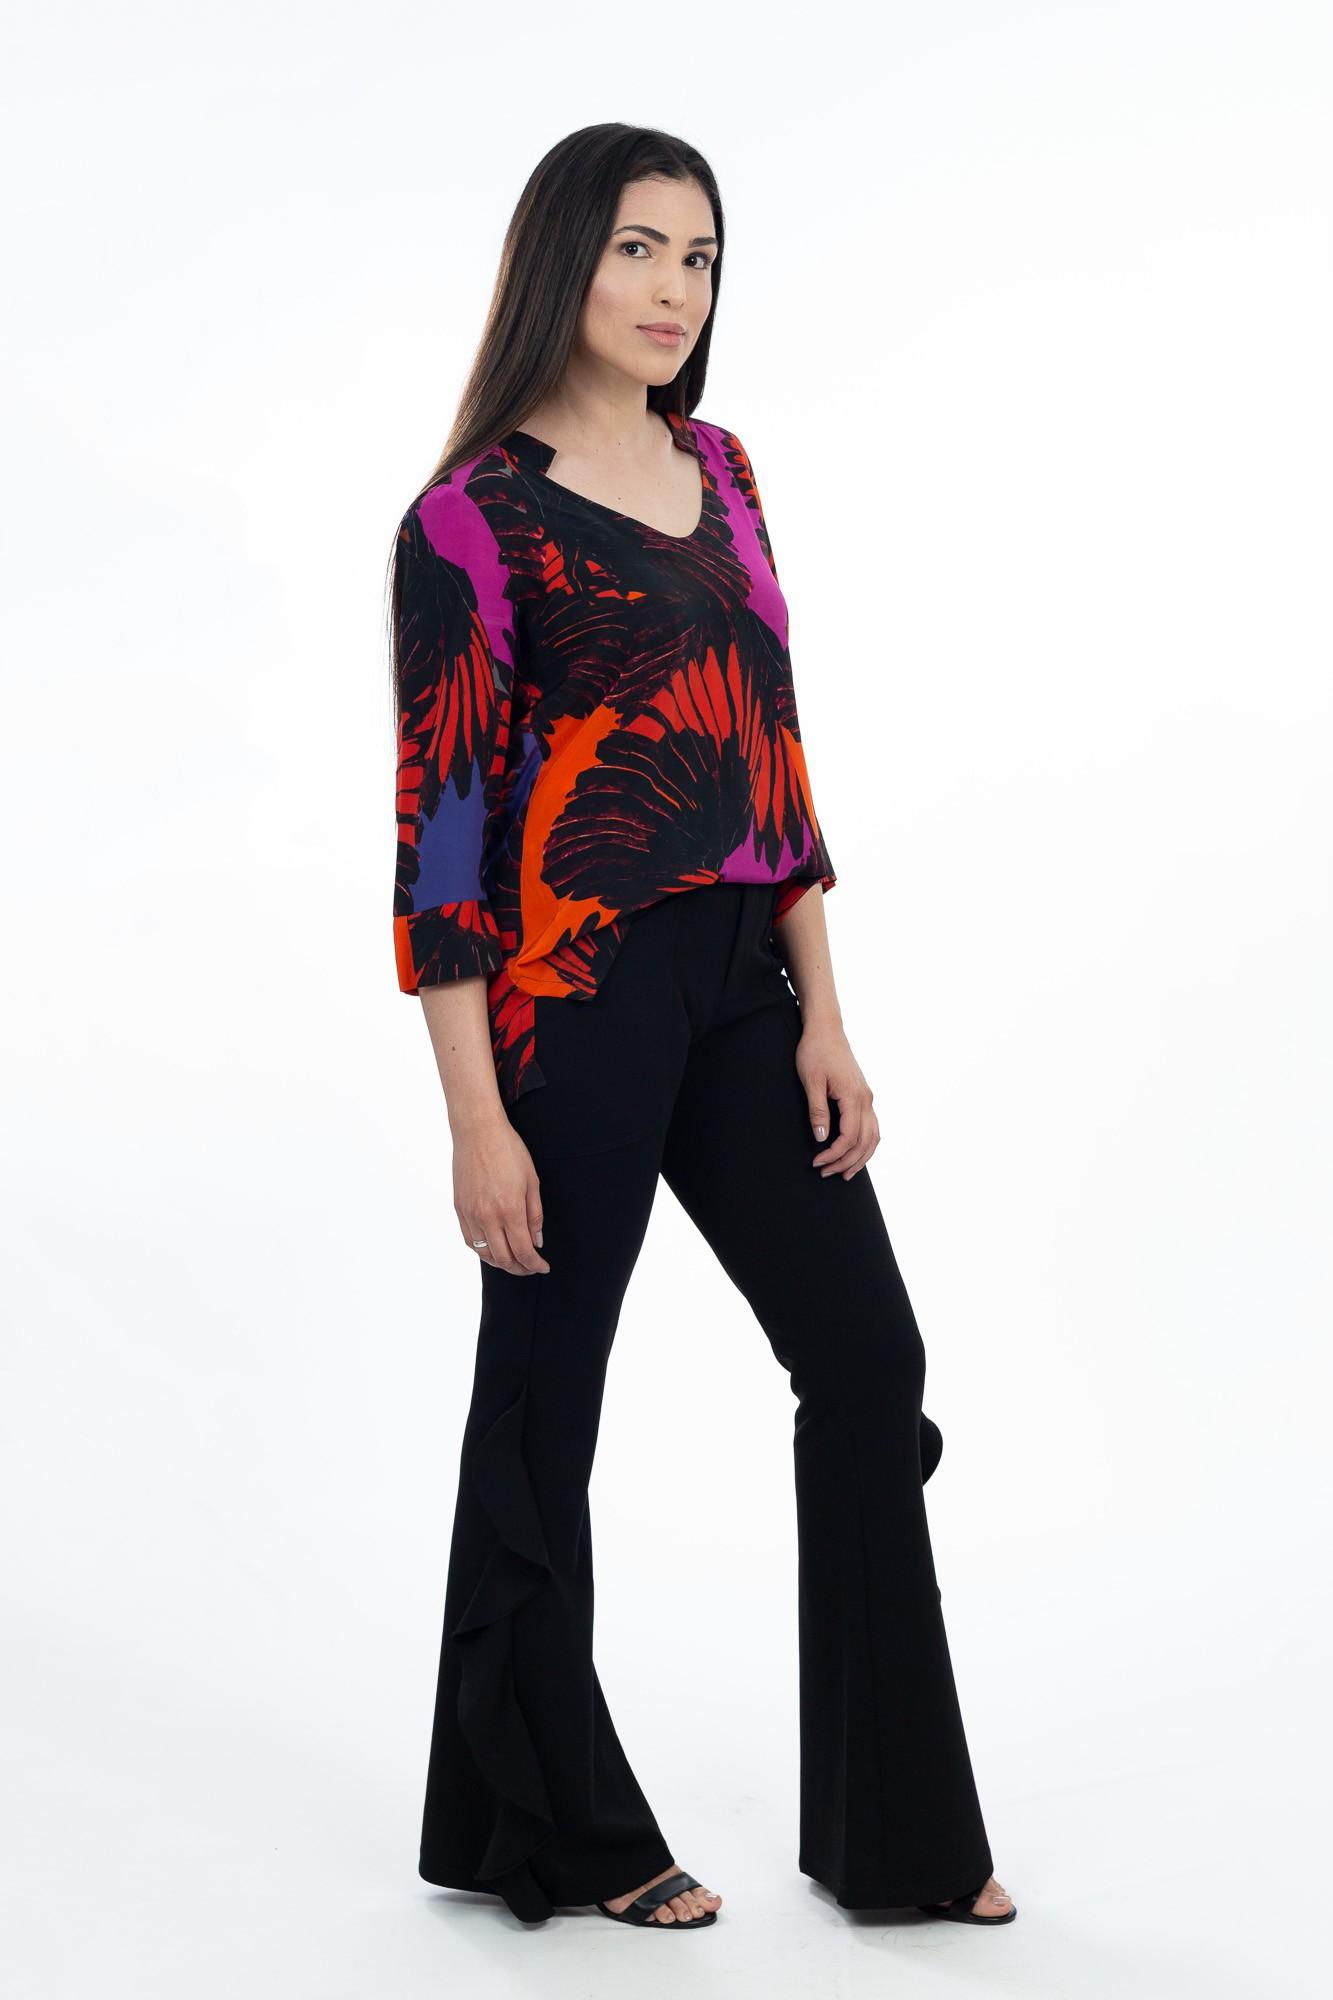 Blusa seda laranja/preta/roxa Fit tam 44